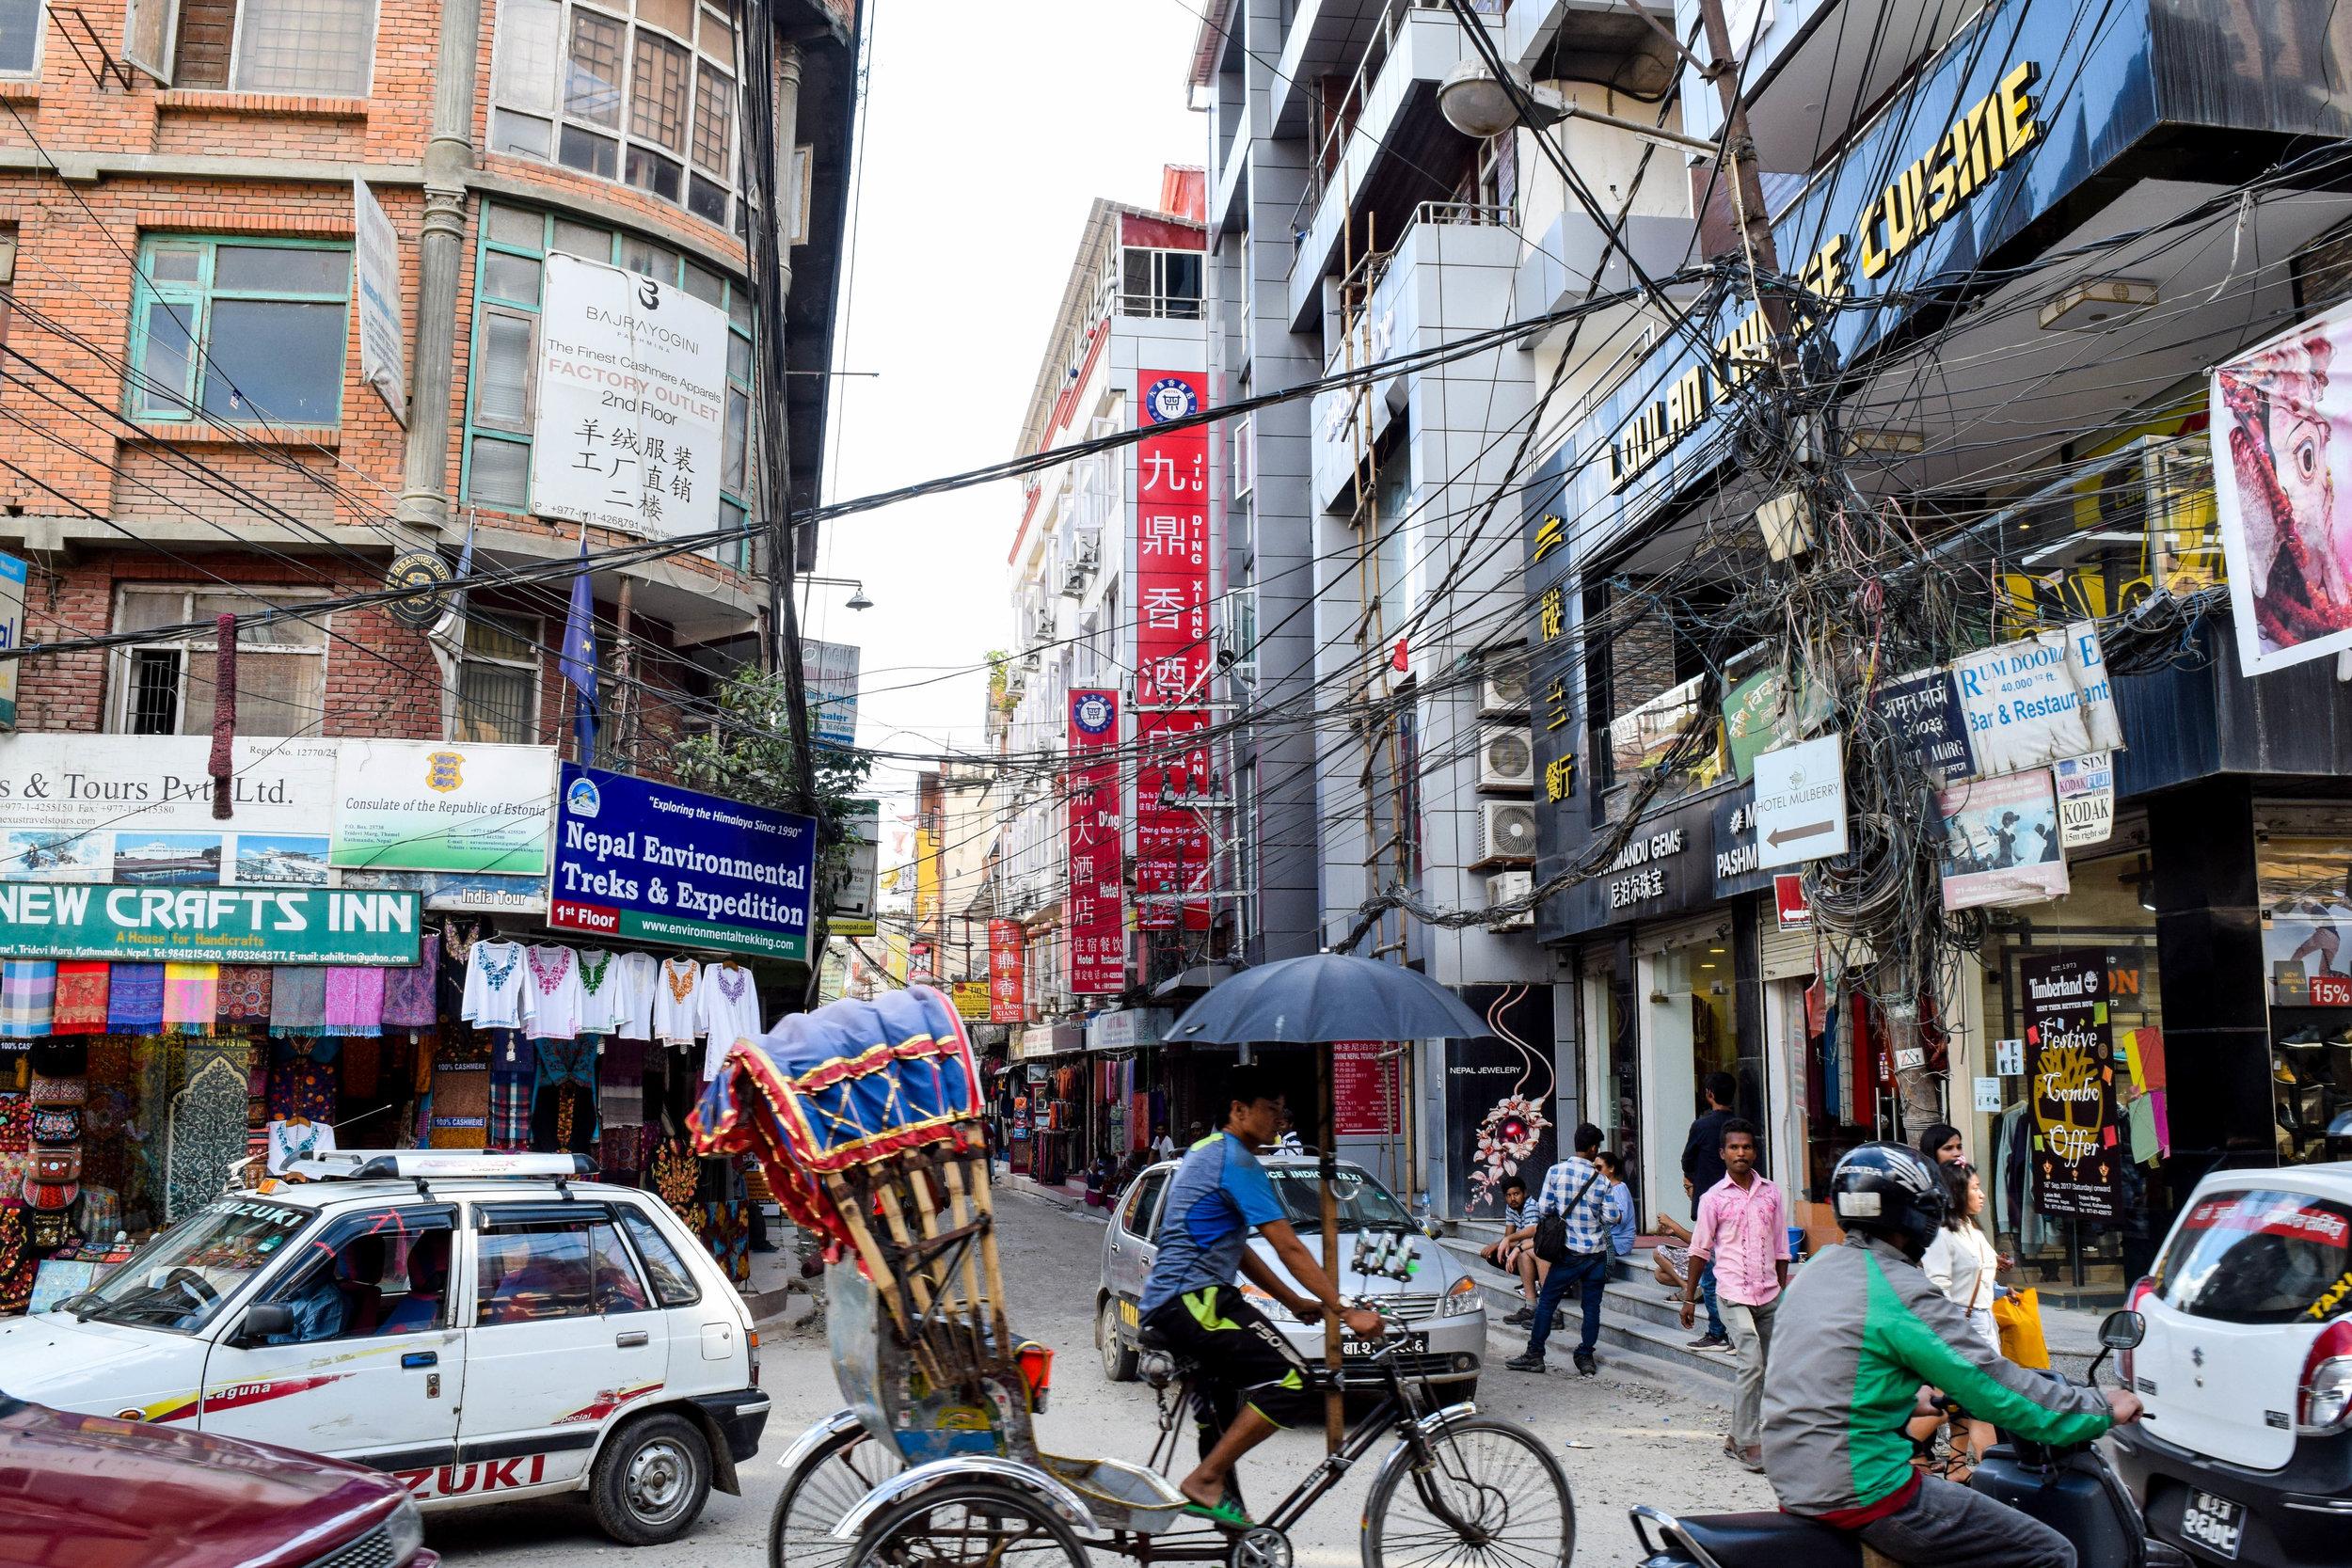 Ah, Kathmandu. So calm. So peaceful.